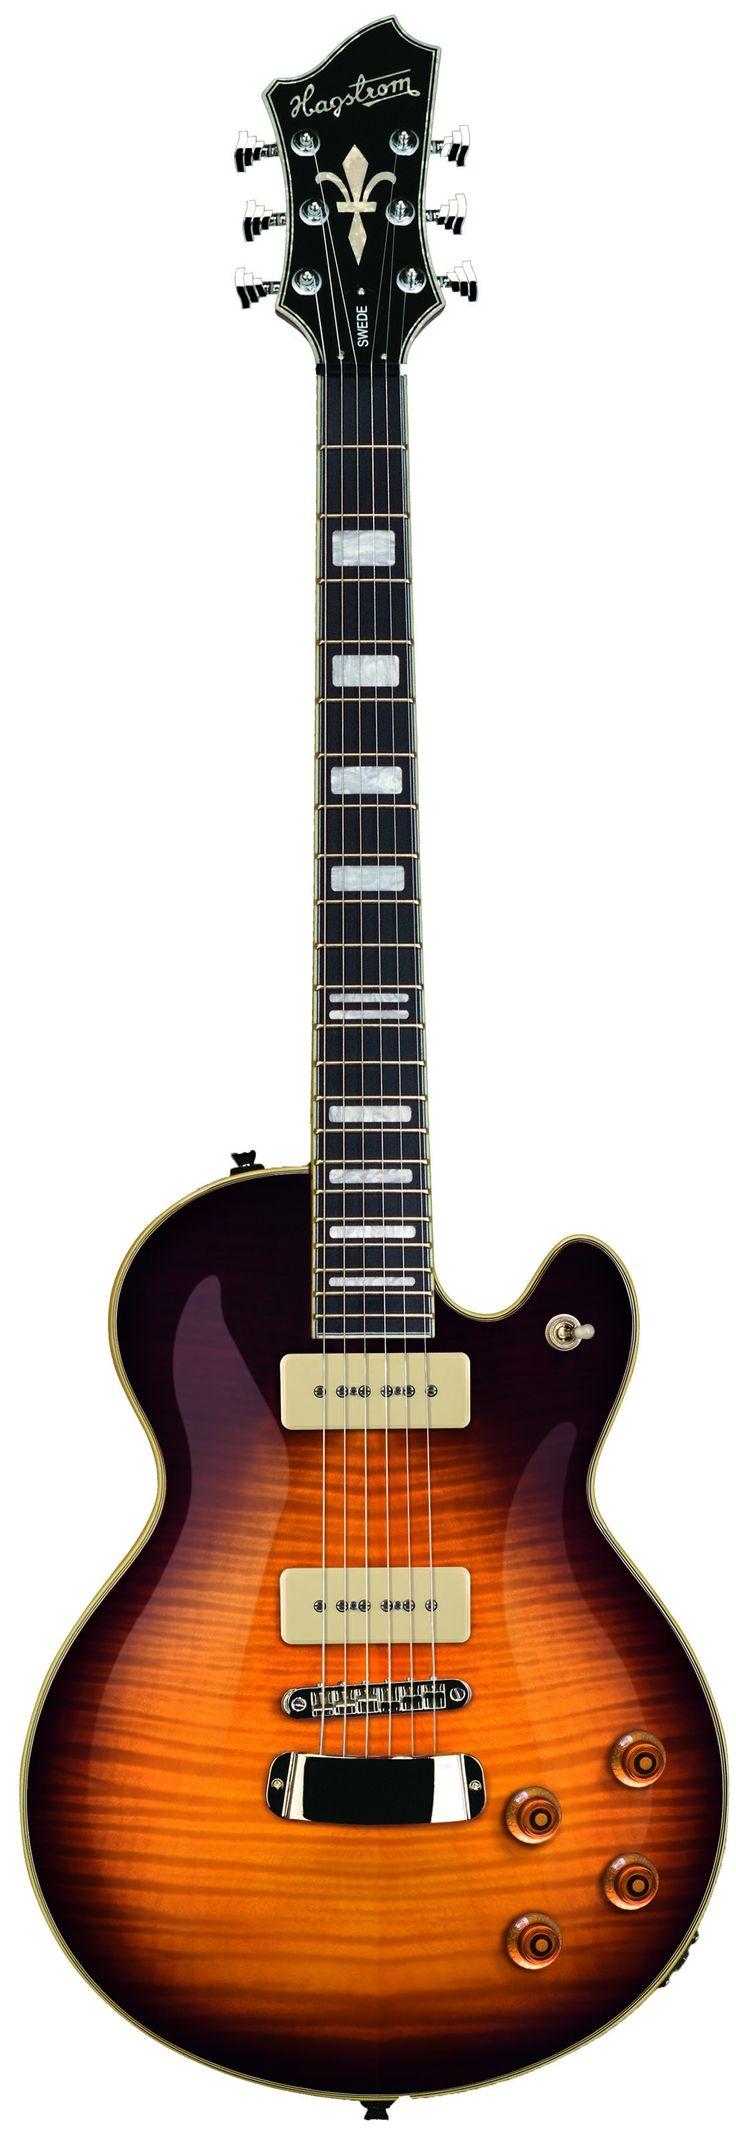 Hagstrom Swede SE P-90 Vintage Sunburst #hagstrom #guitar